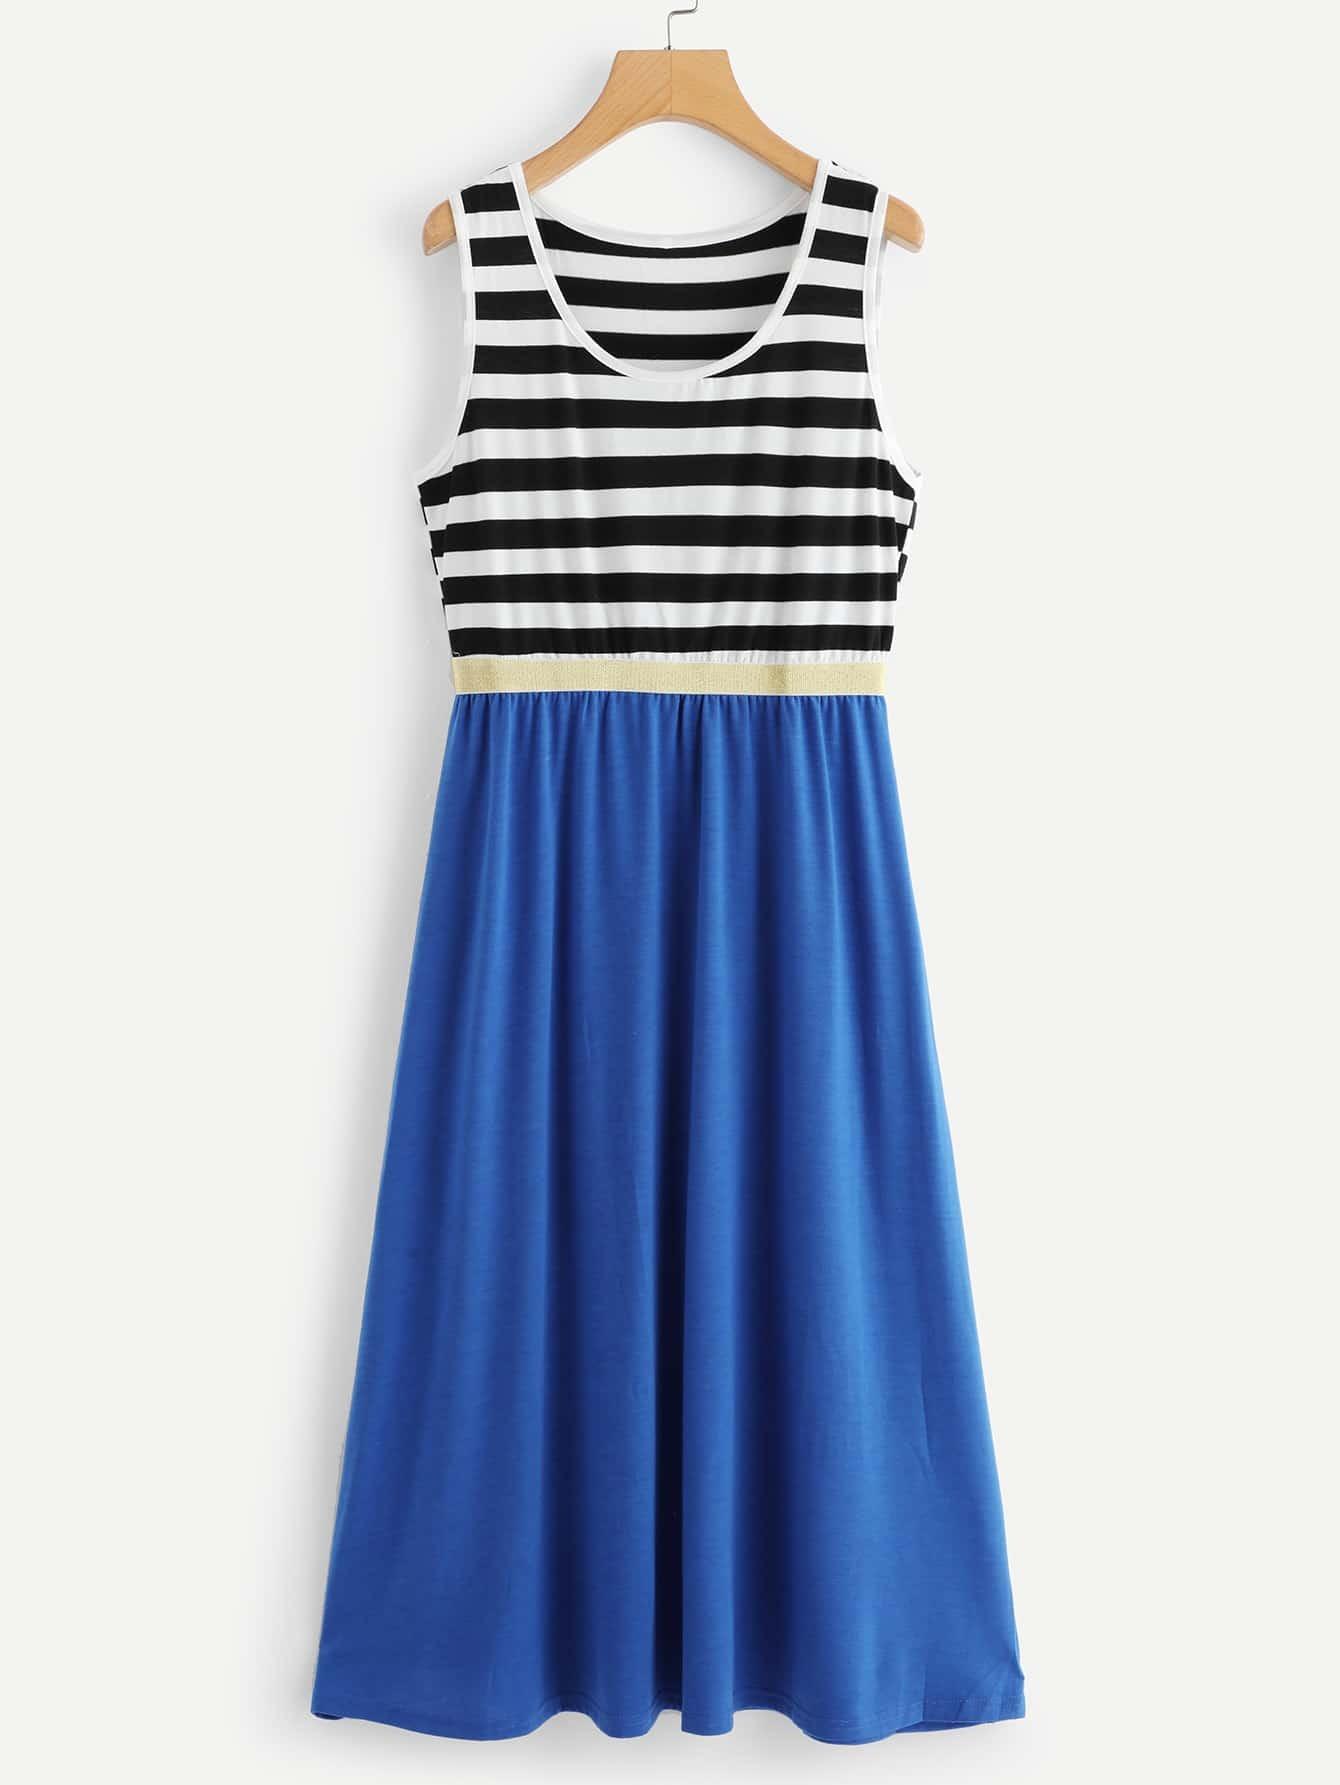 Contrast Striped Sleeveless Dress